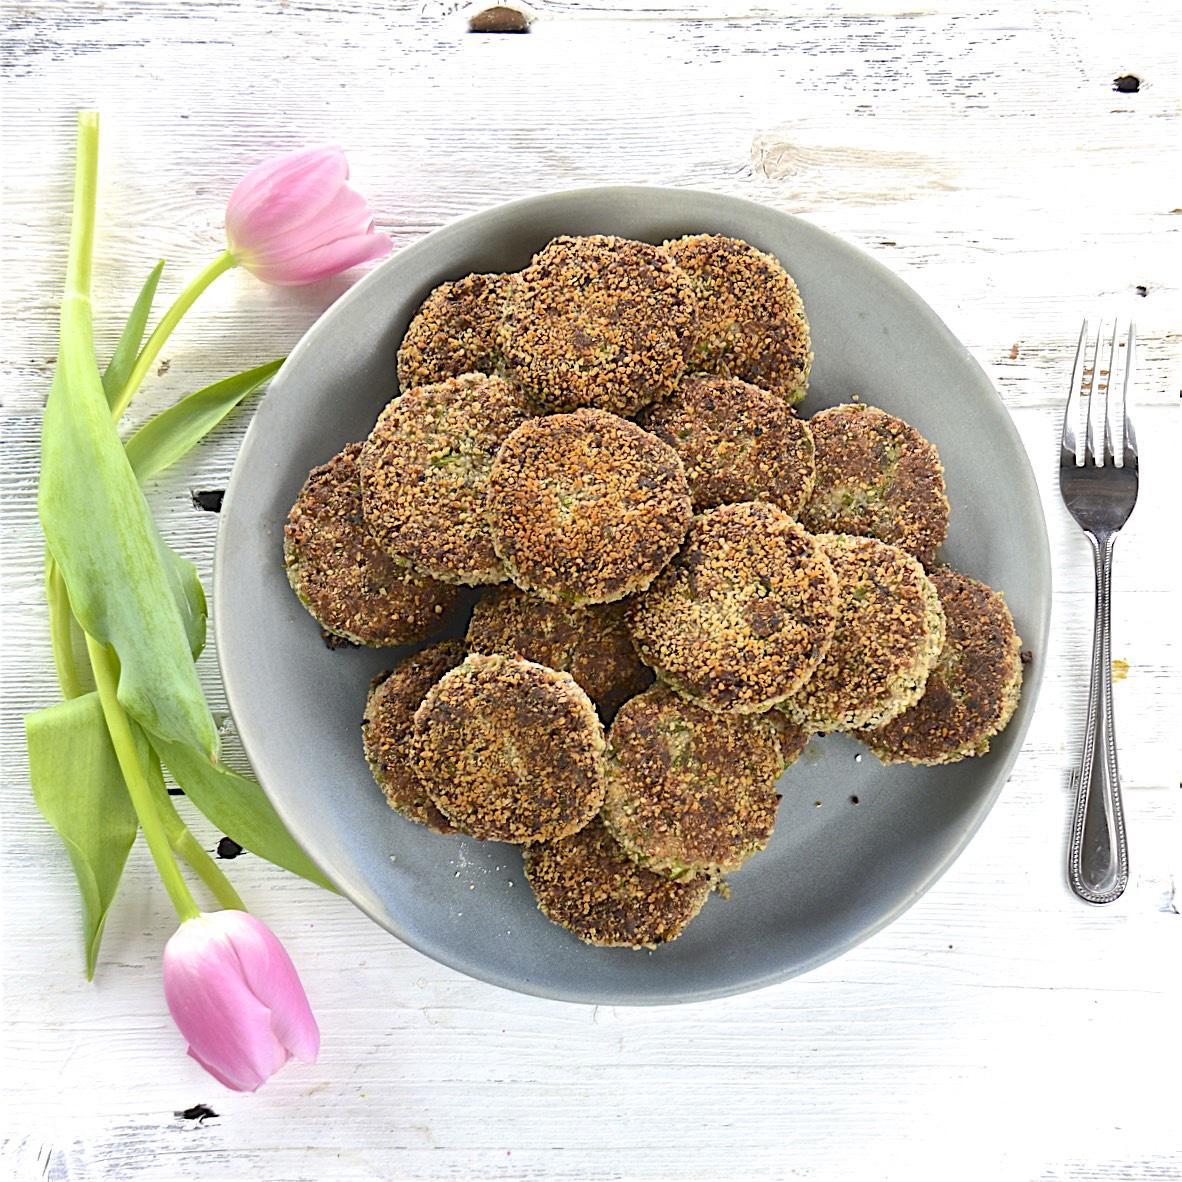 Dinas Protein Spiked Vegetarian Patties